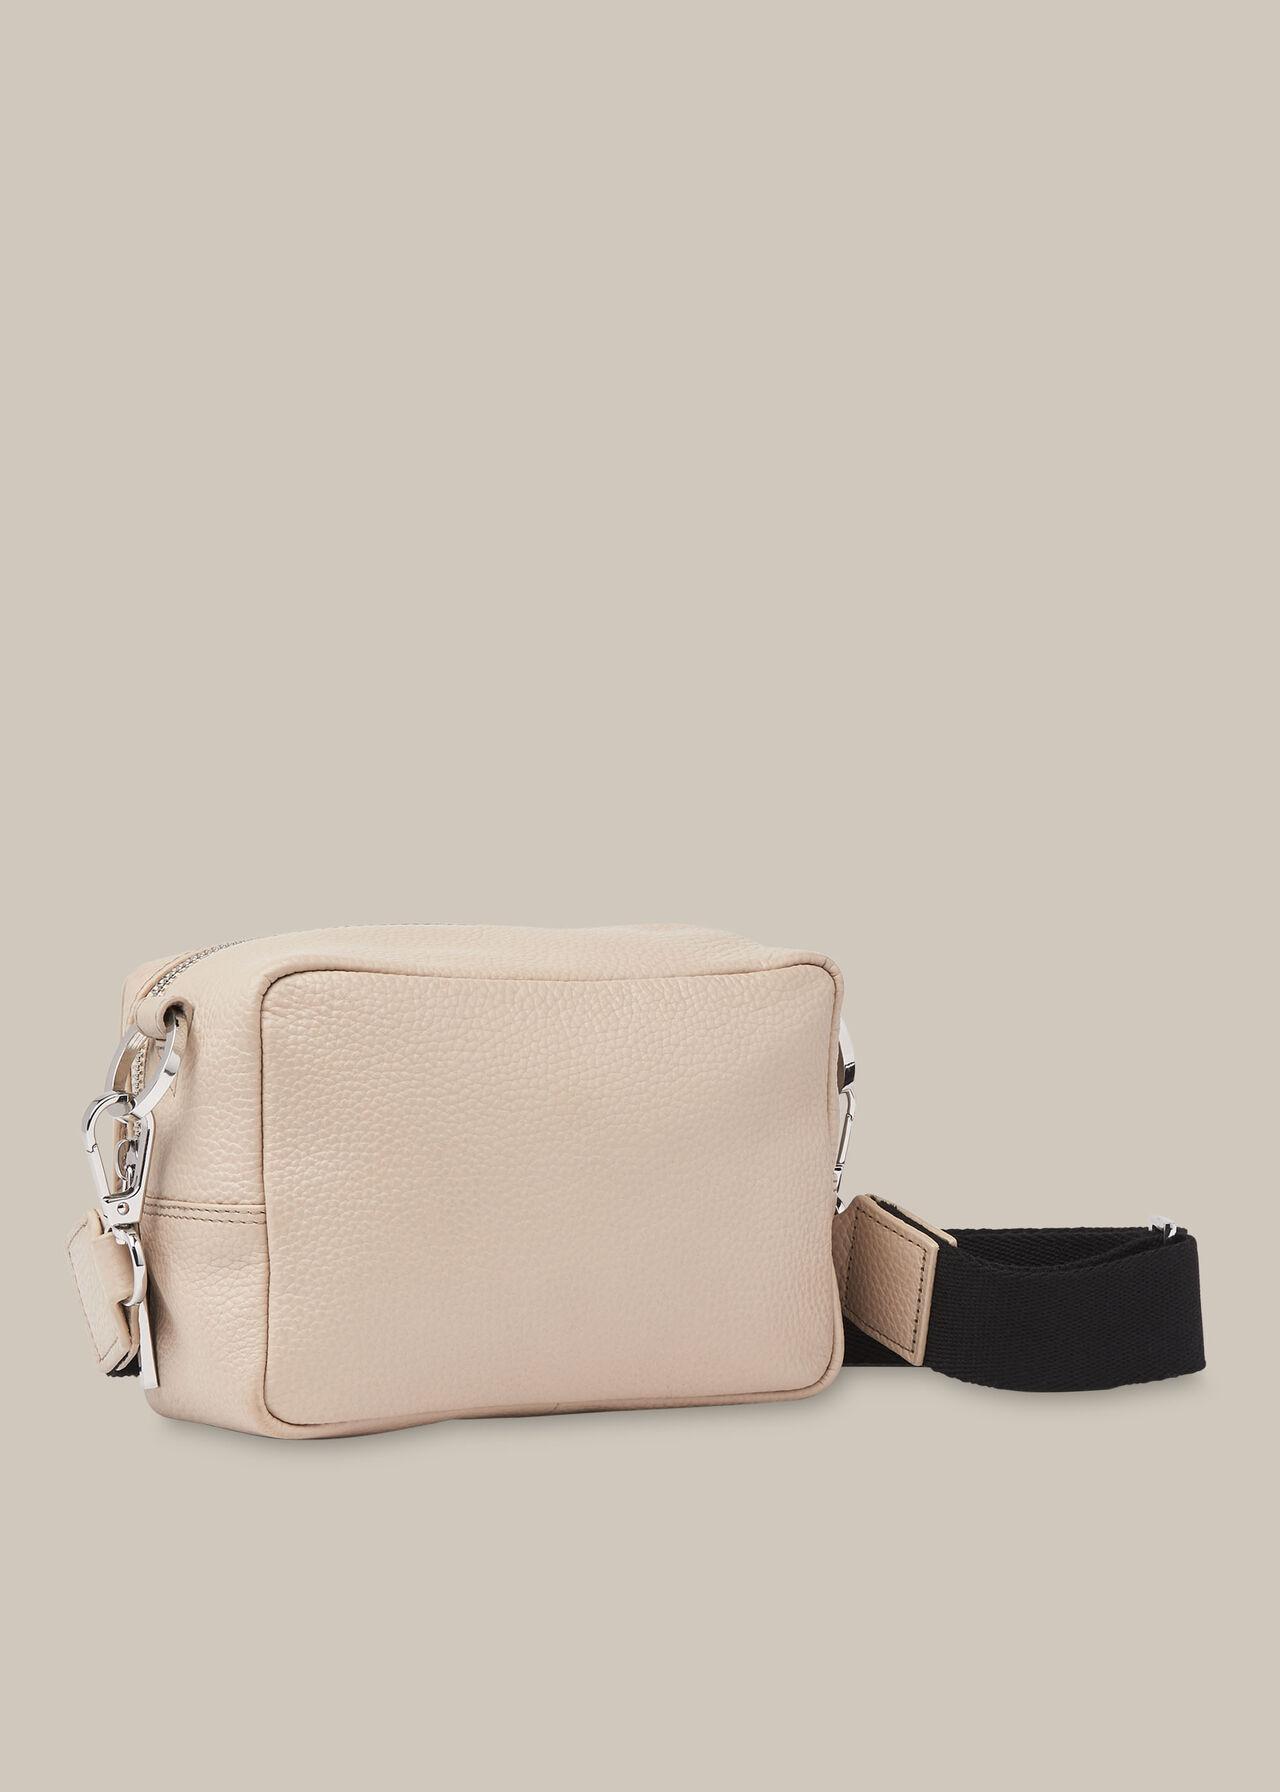 Bibi Crossbody Bag Taupe